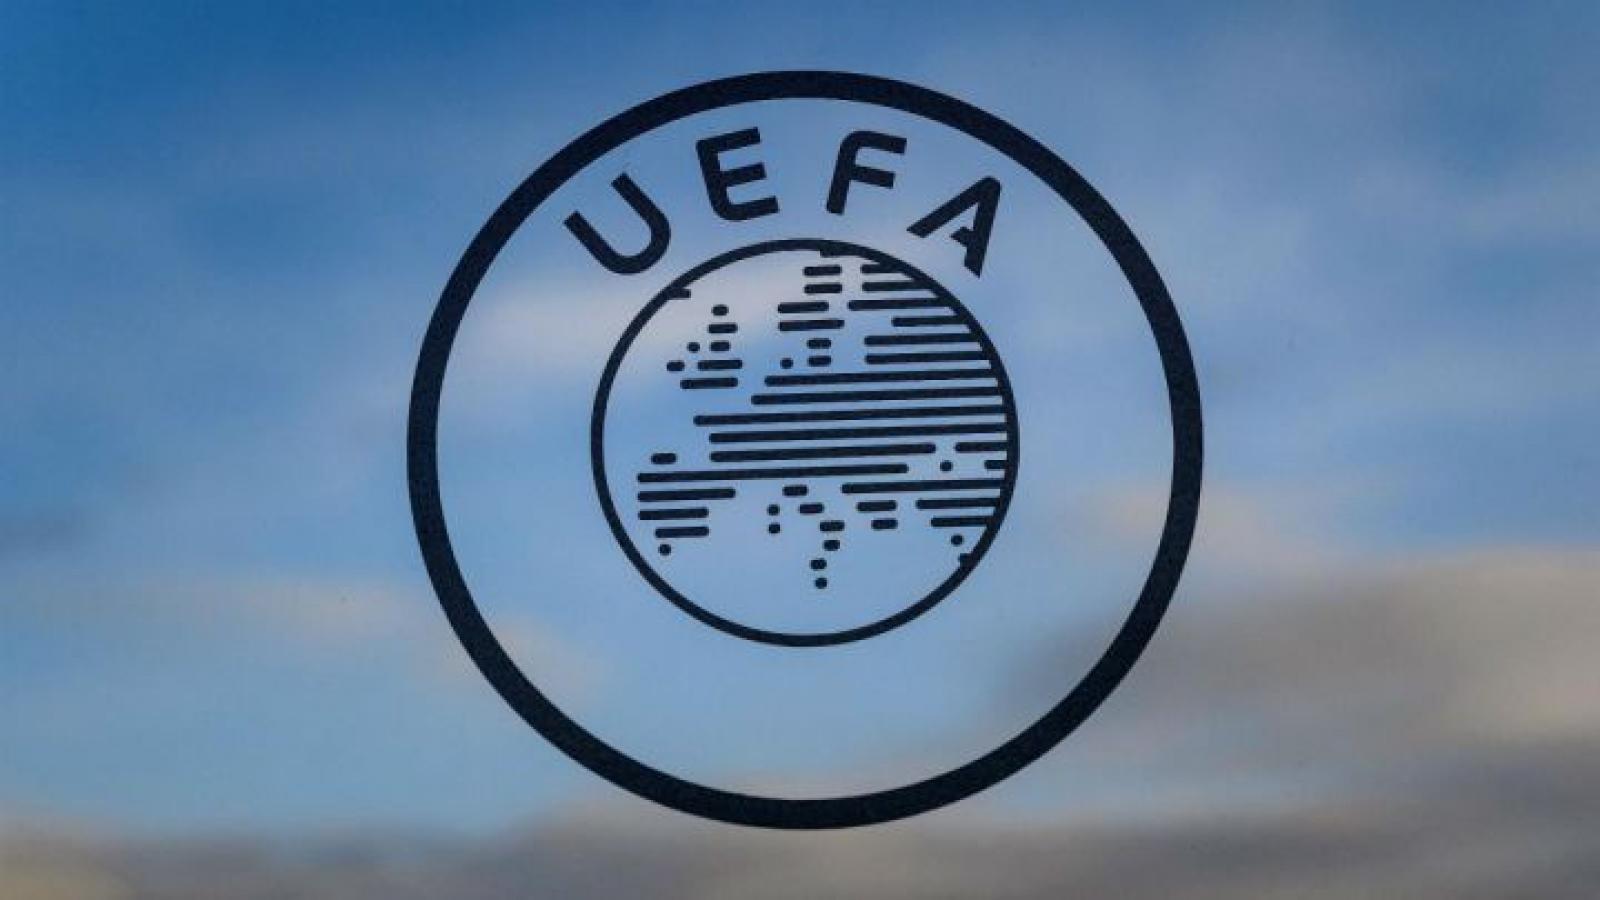 UEFA dọa trừng phạt những đội bóng tham gia Super League